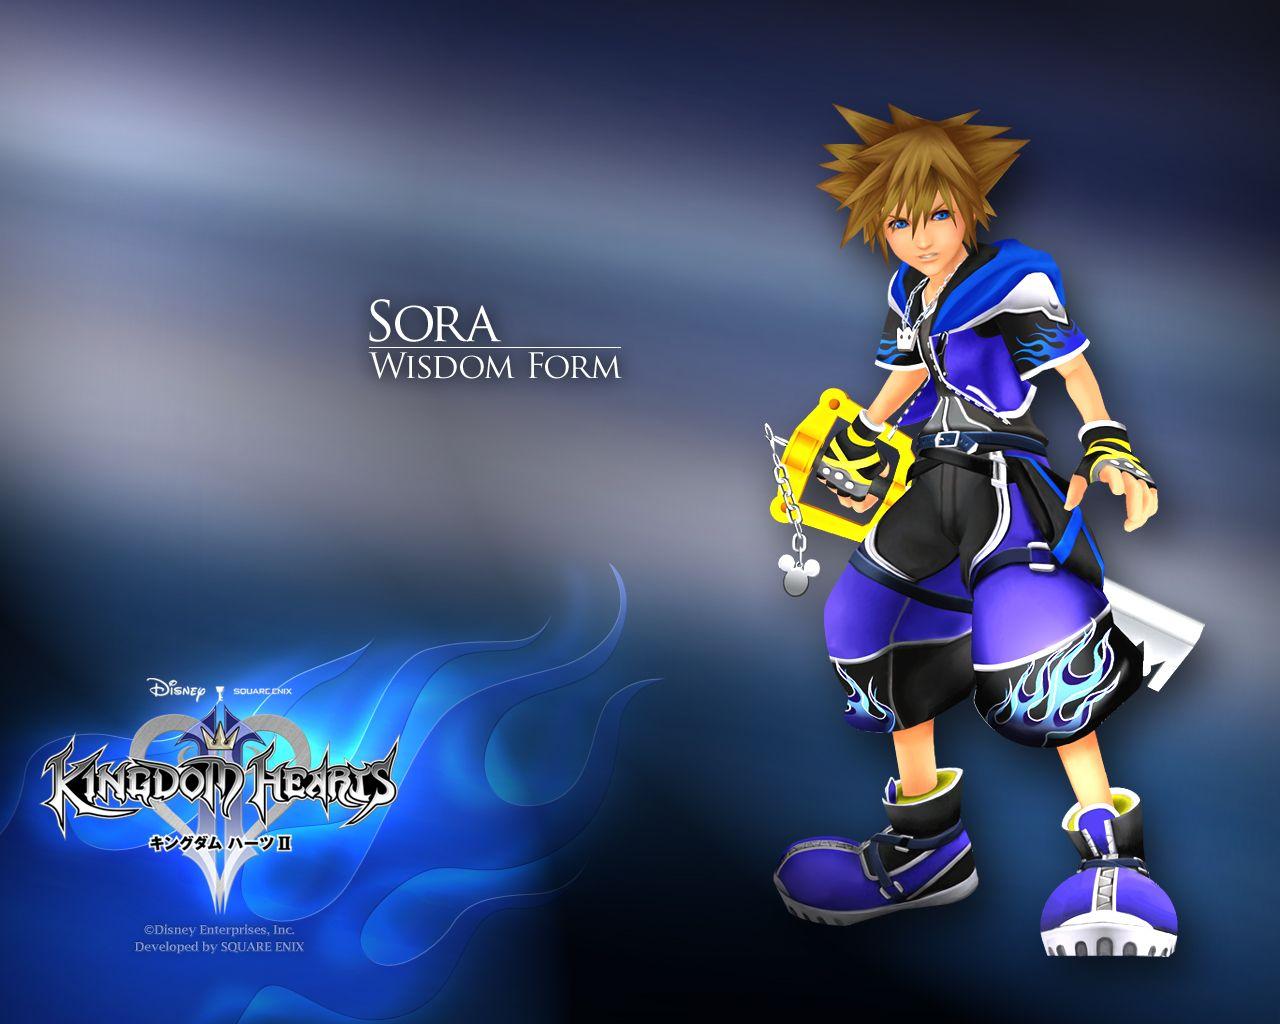 Kingdom Hearts Sora Wallpaper Full Hd Sora Kingdom Hearts Kingdom Hearts Kingdom Hearts Wallpaper